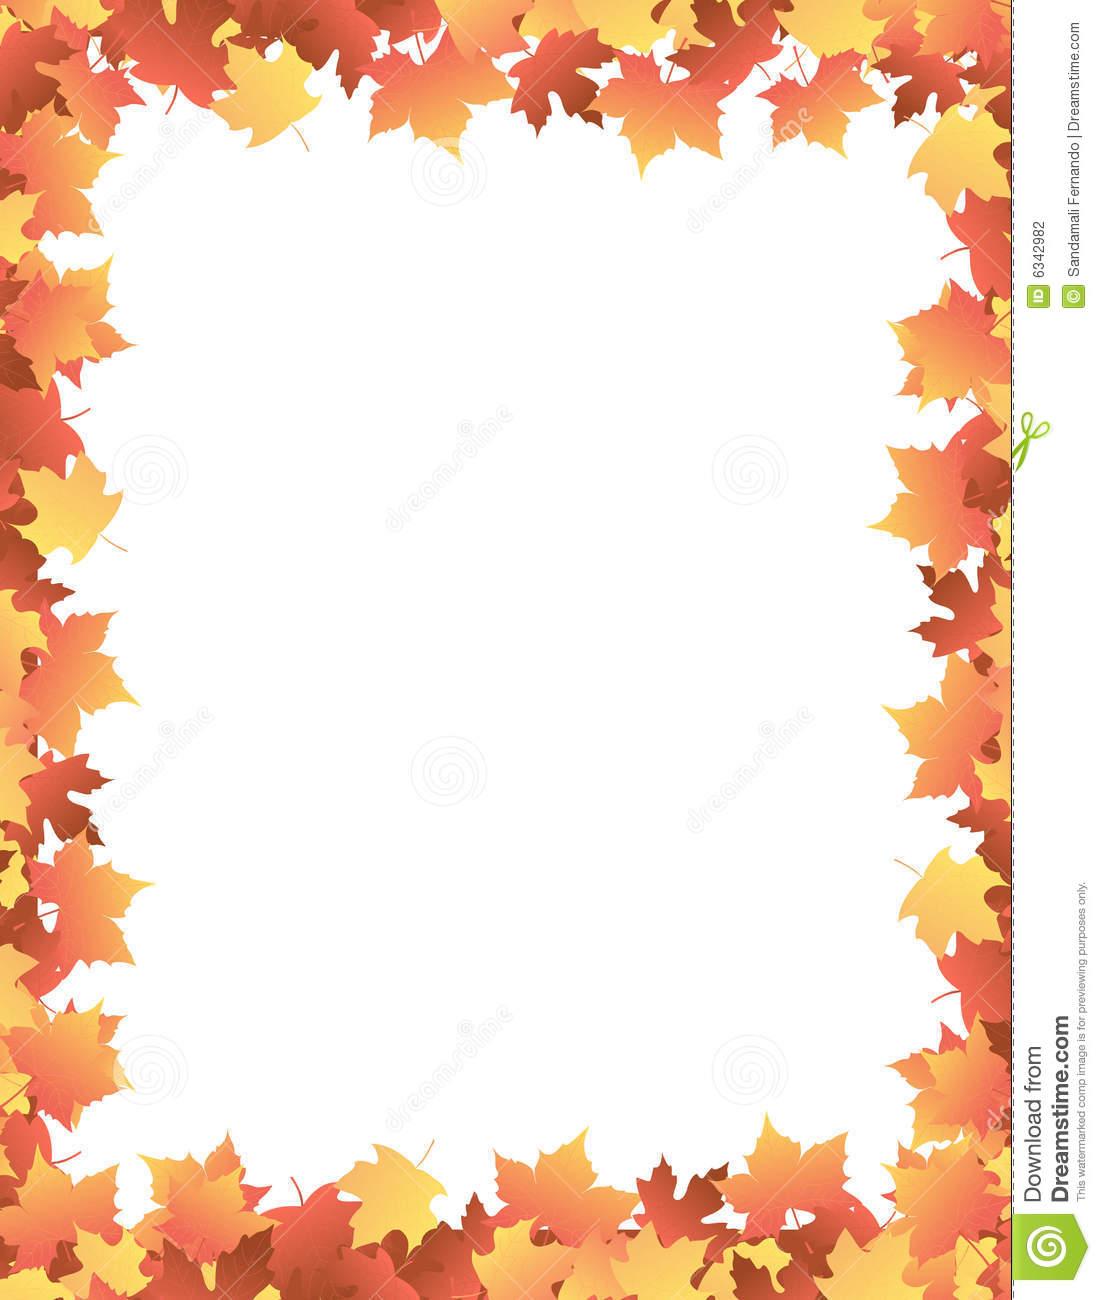 Fall Leaves Clip Art Border Recipe 101-Fall Leaves Clip Art Border Recipe 101-11